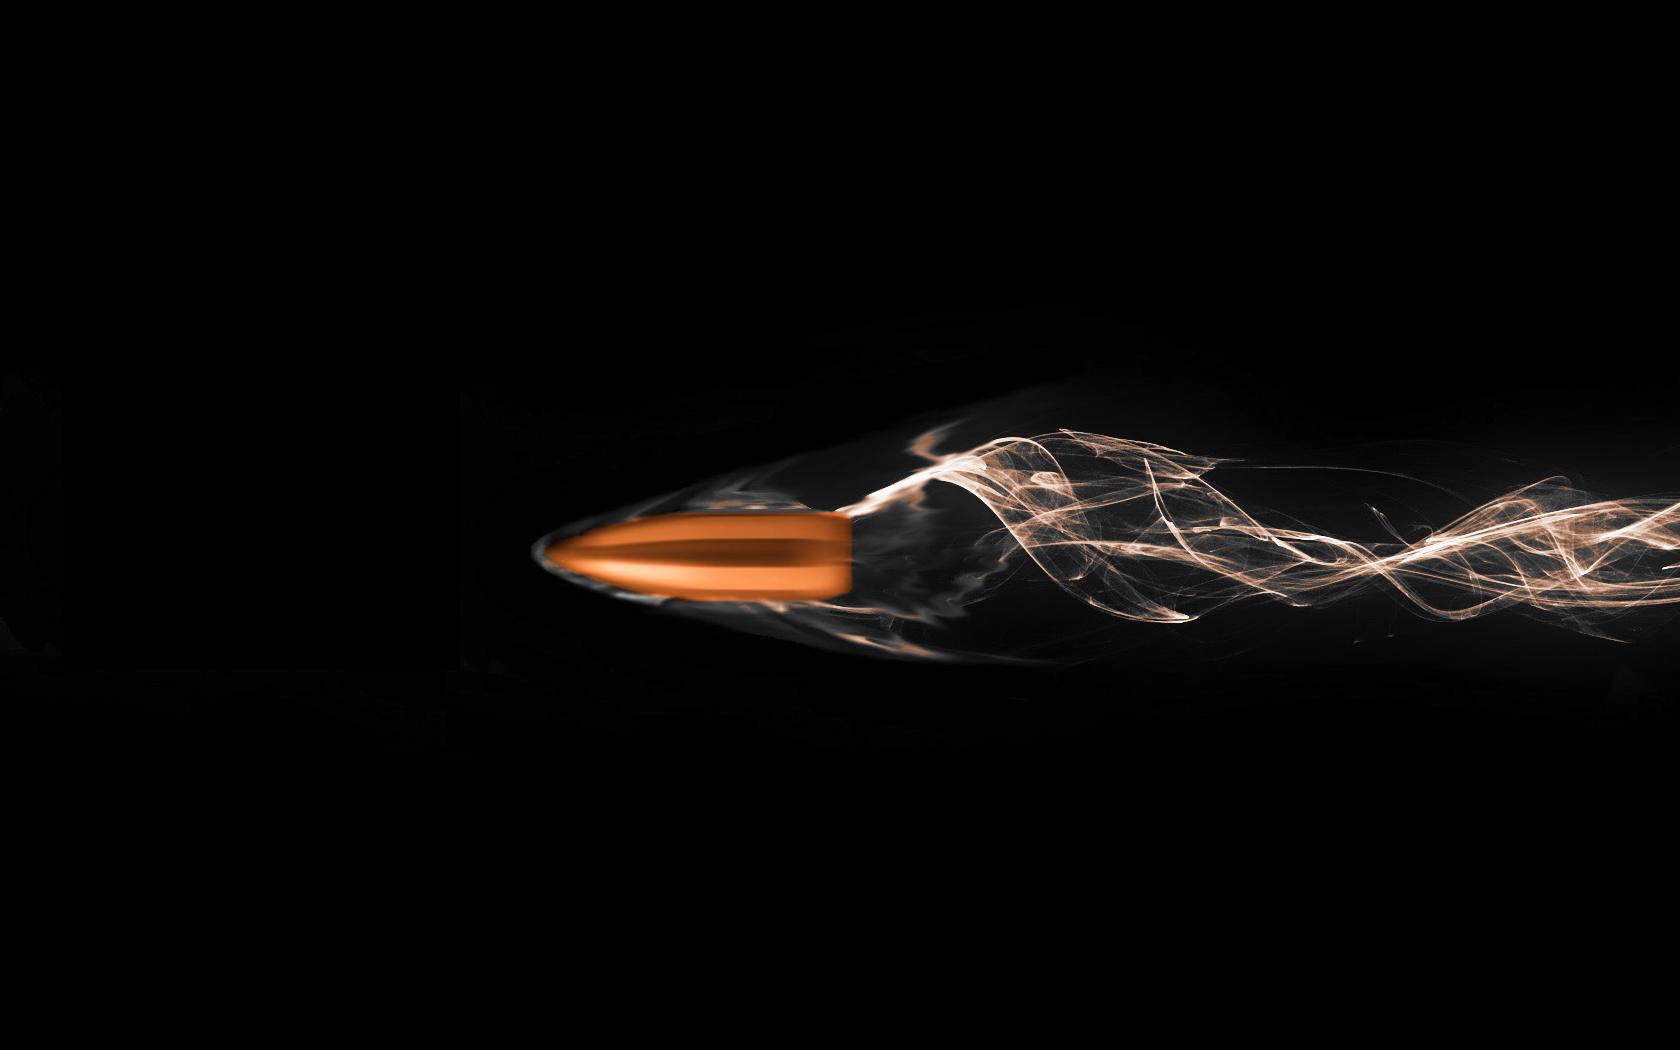 Bullet HD PNG - 95815